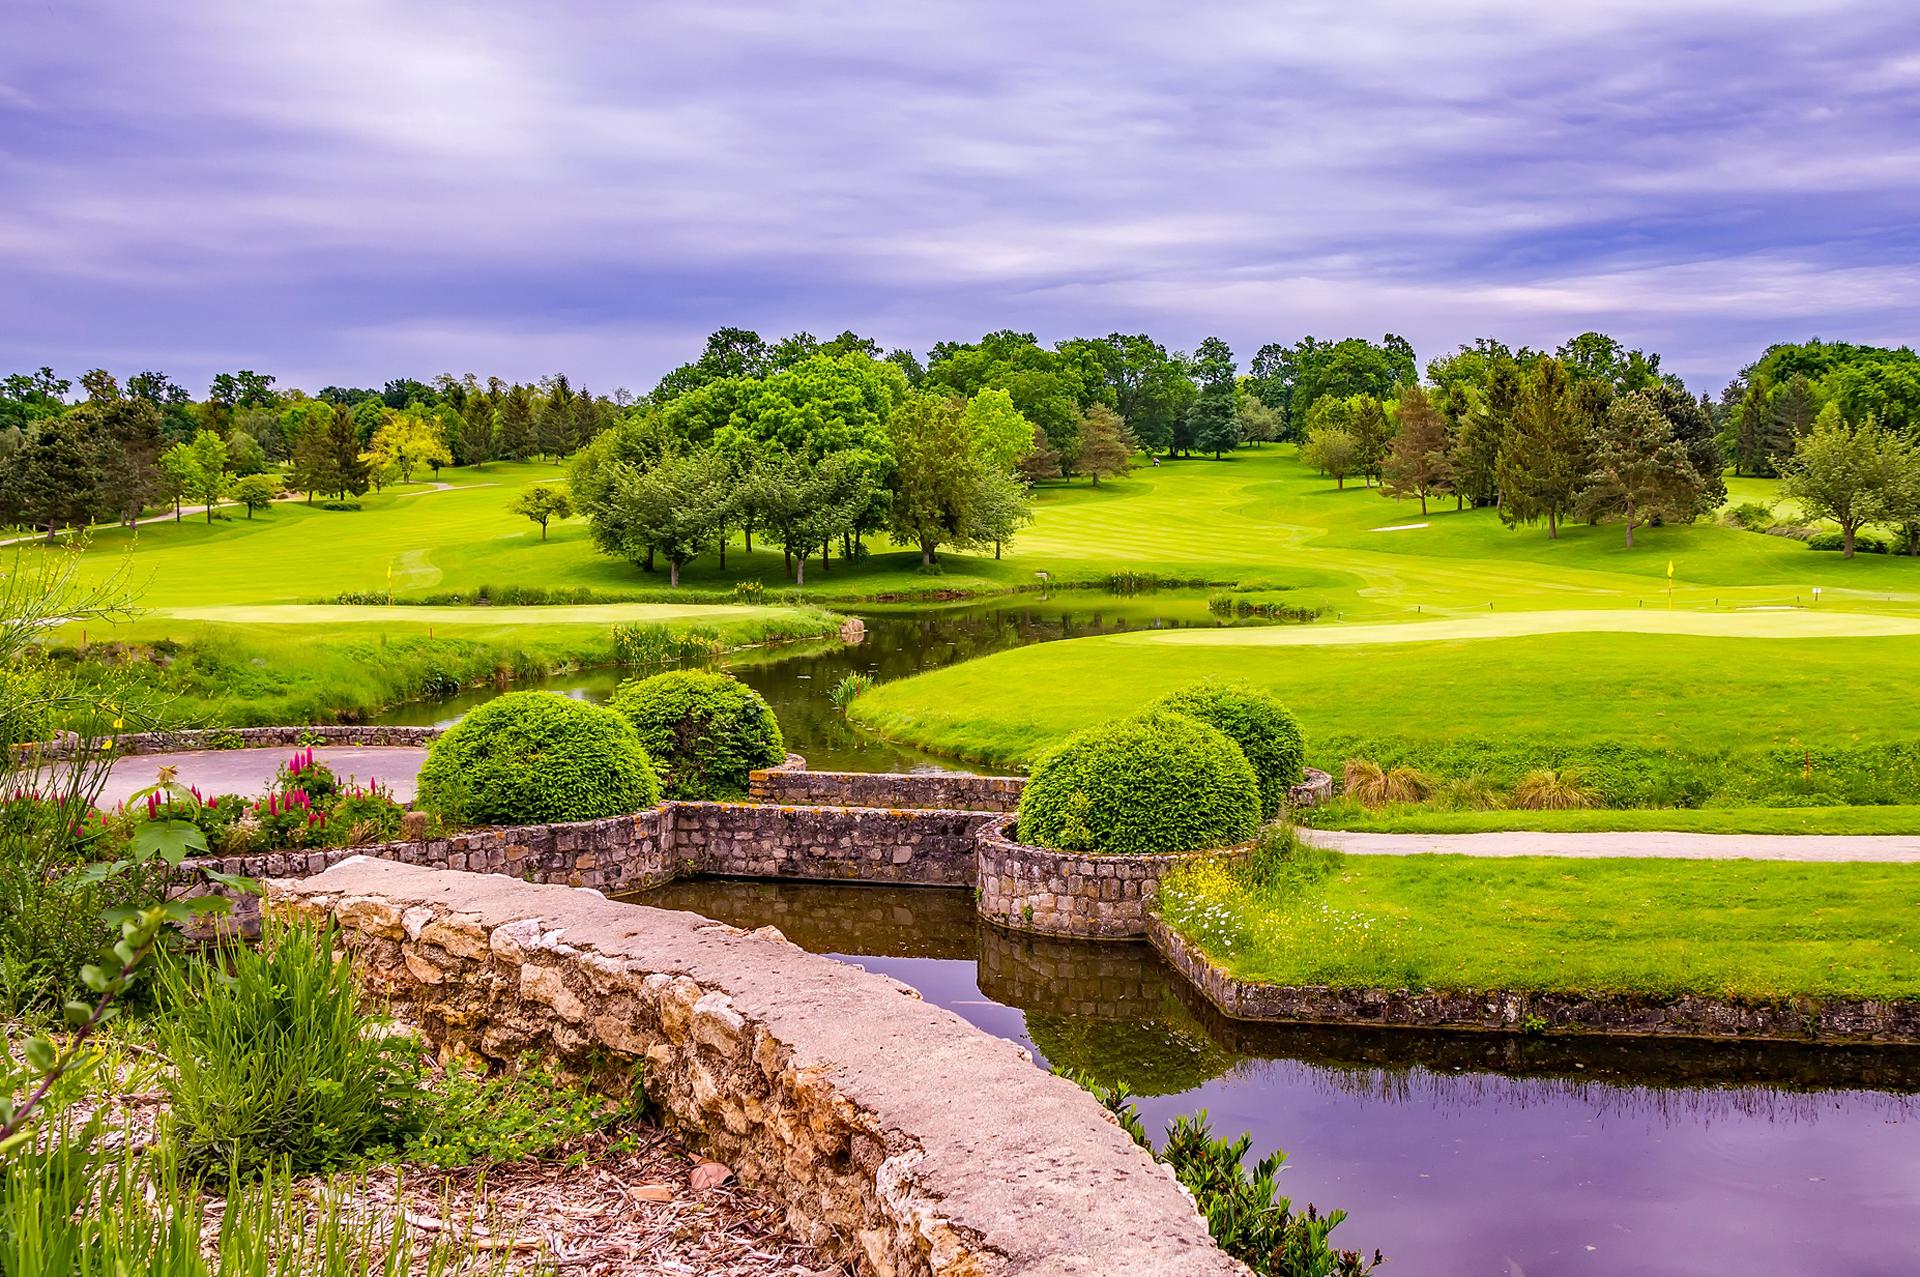 sm-golf-course-1824369